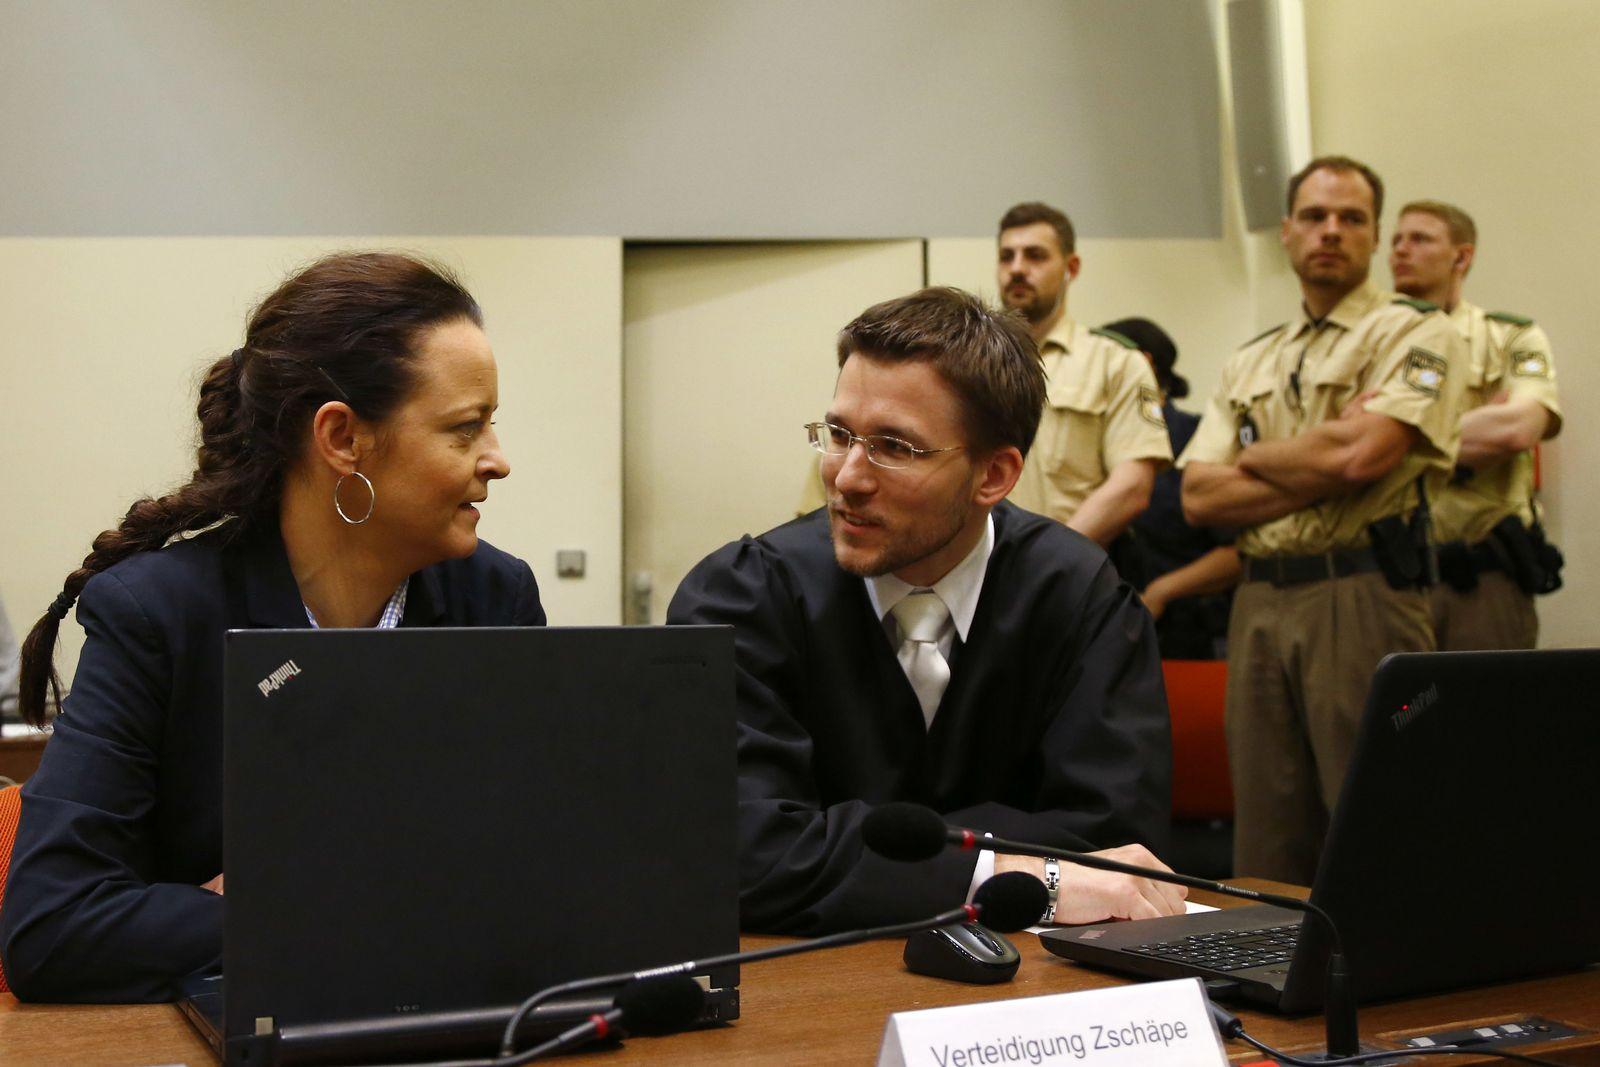 Germany Terror Trial